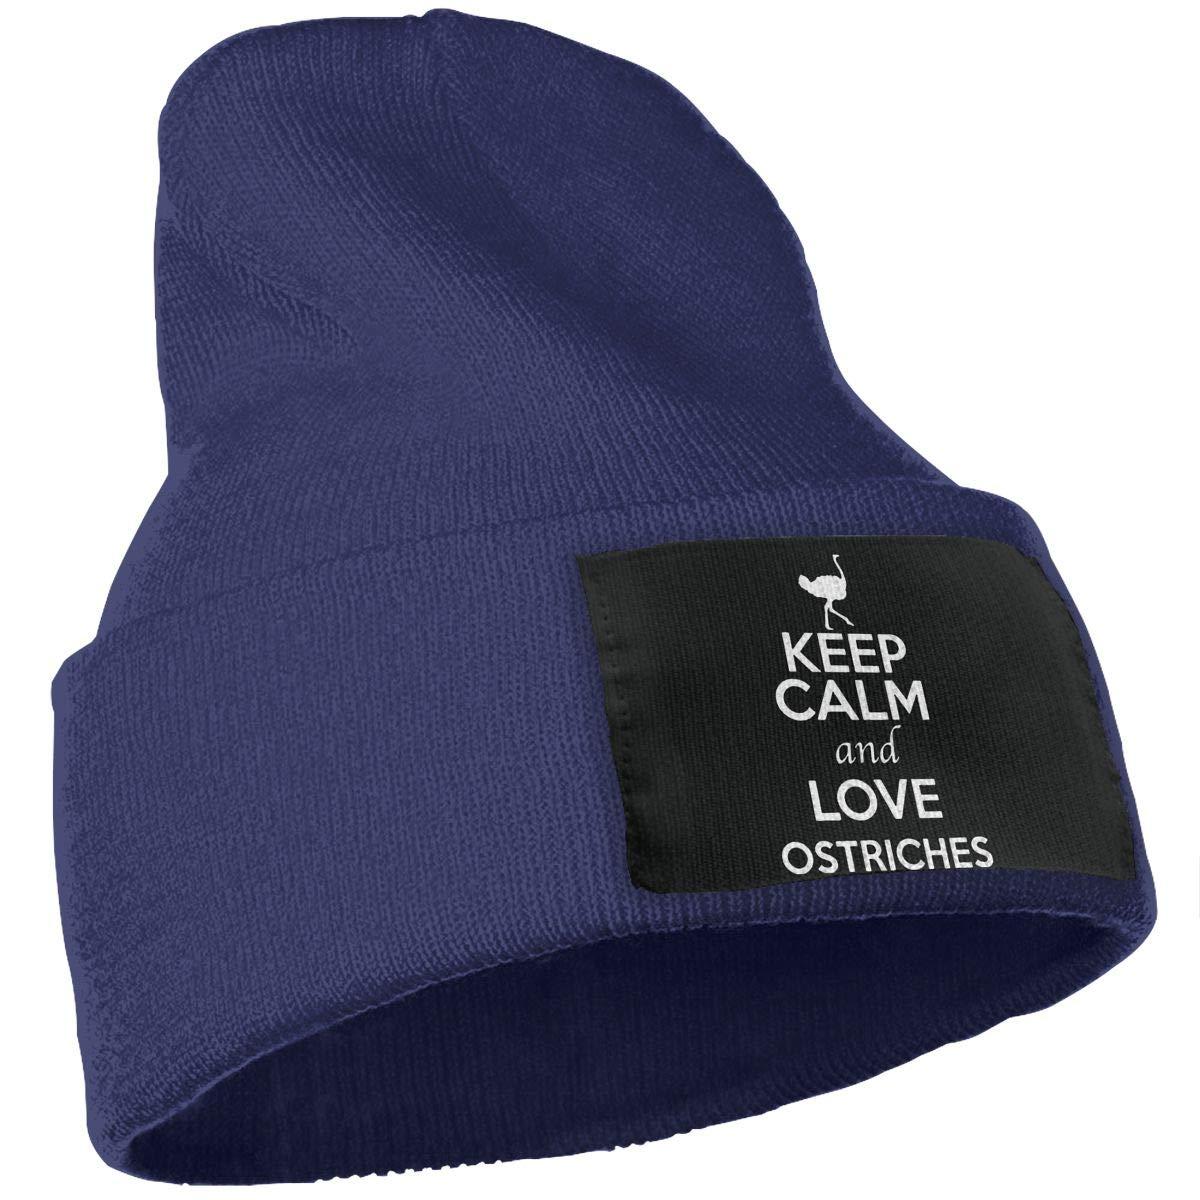 Keep Calm and Love Ostriches Warm Winter Hat Knit Beanie Skull Cap Cuff Beanie Hat Winter Hats for Men /& Women